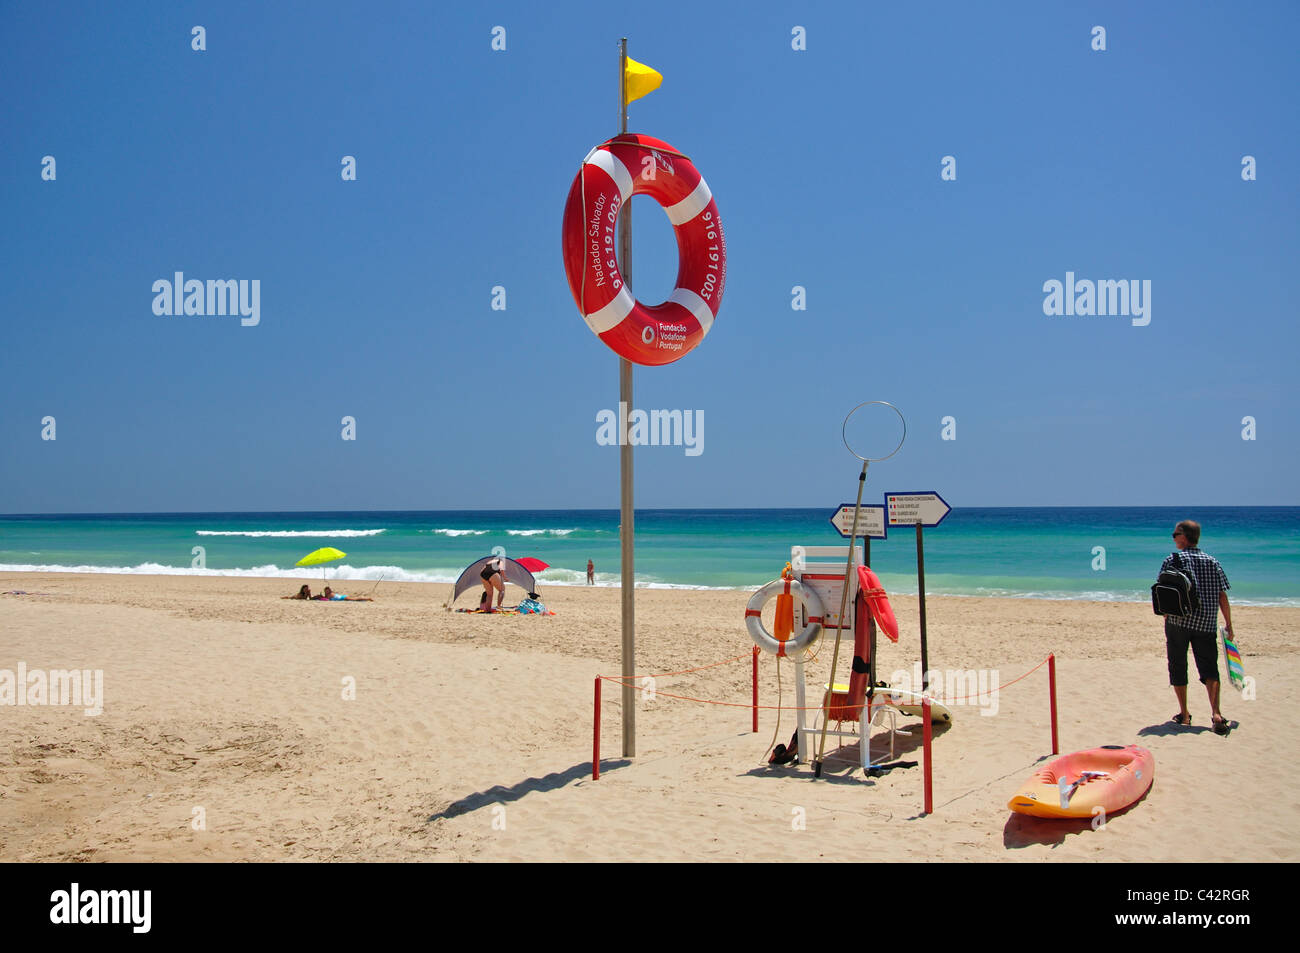 Praia de Salema, Salema, Faro District, Algarve Region, Portugal - Stock Image